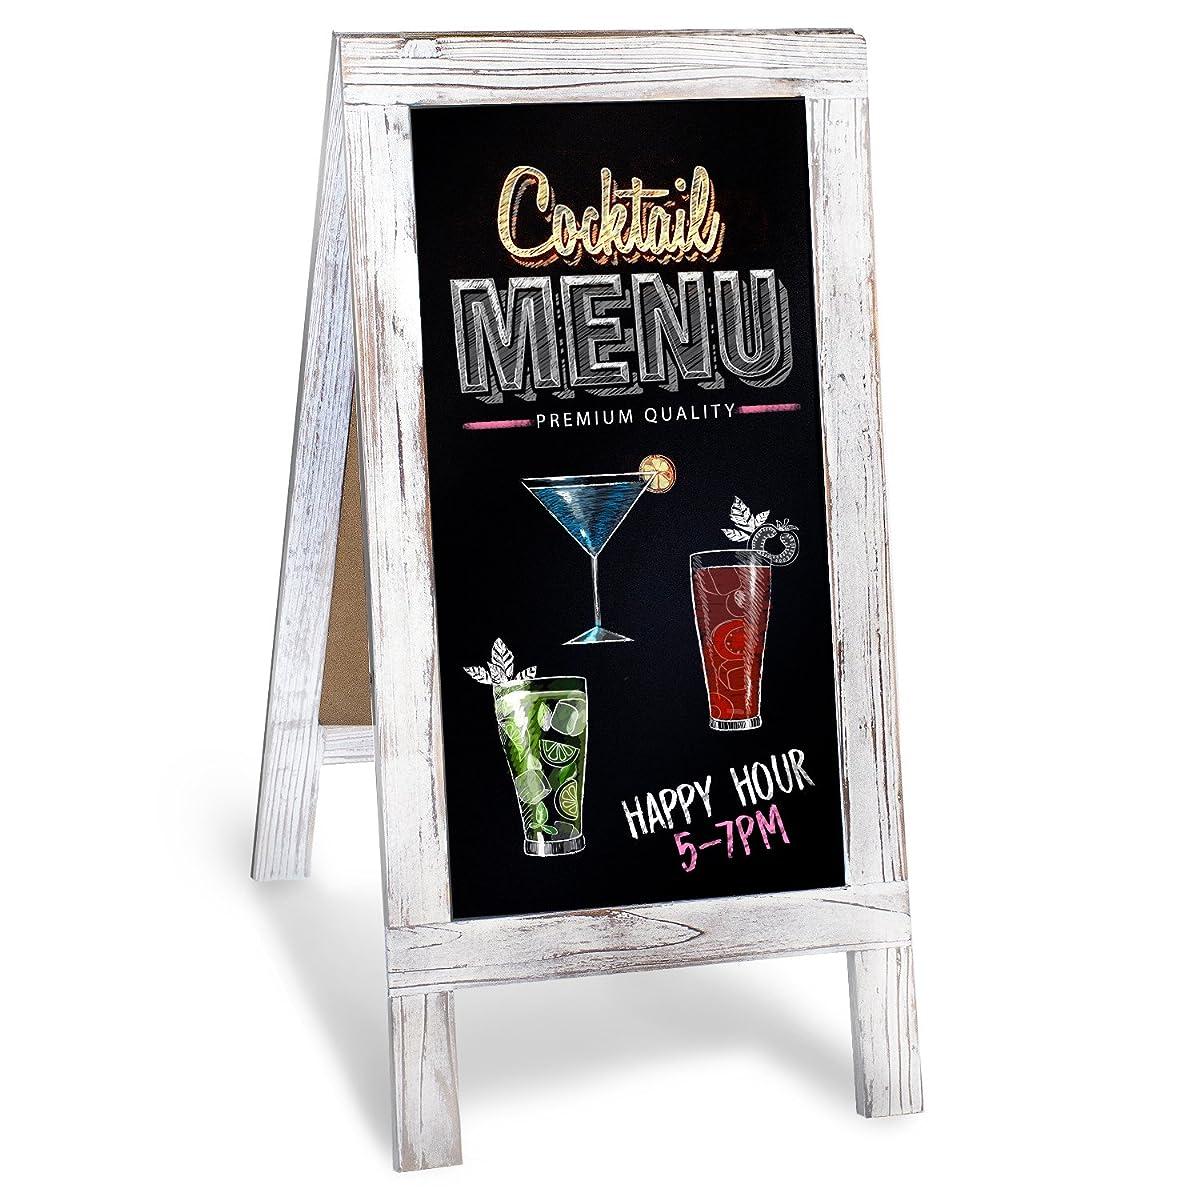 chalkboard a frame with rustic vintage gray wash frame sandwich board 20in x 40in blackboard. Black Bedroom Furniture Sets. Home Design Ideas